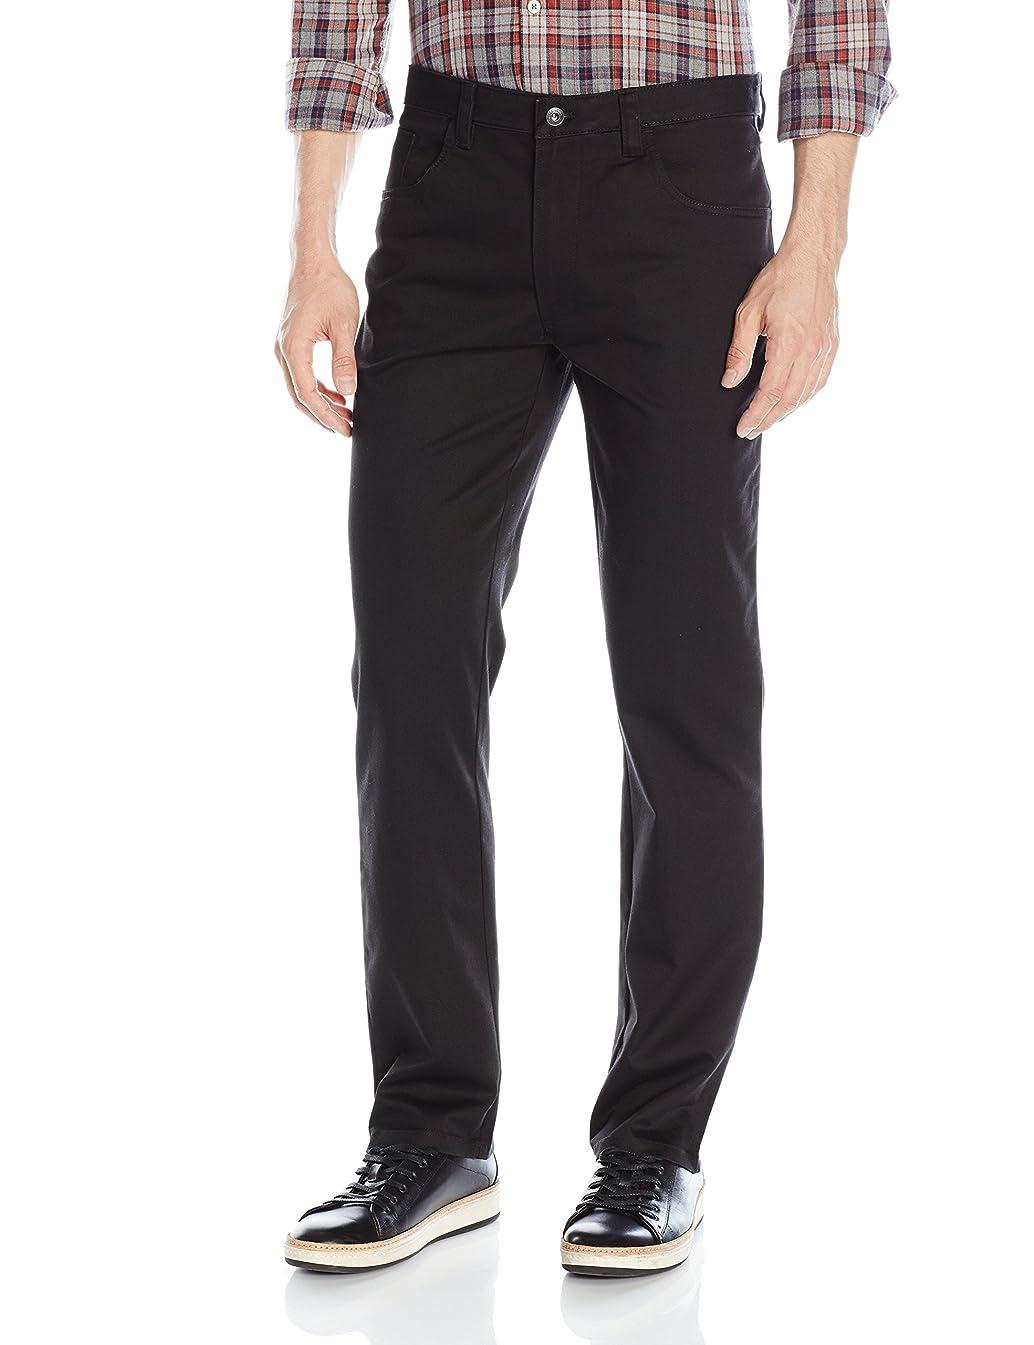 Van Heusen Men's Slim Fit Flex 5 Pocket Pant